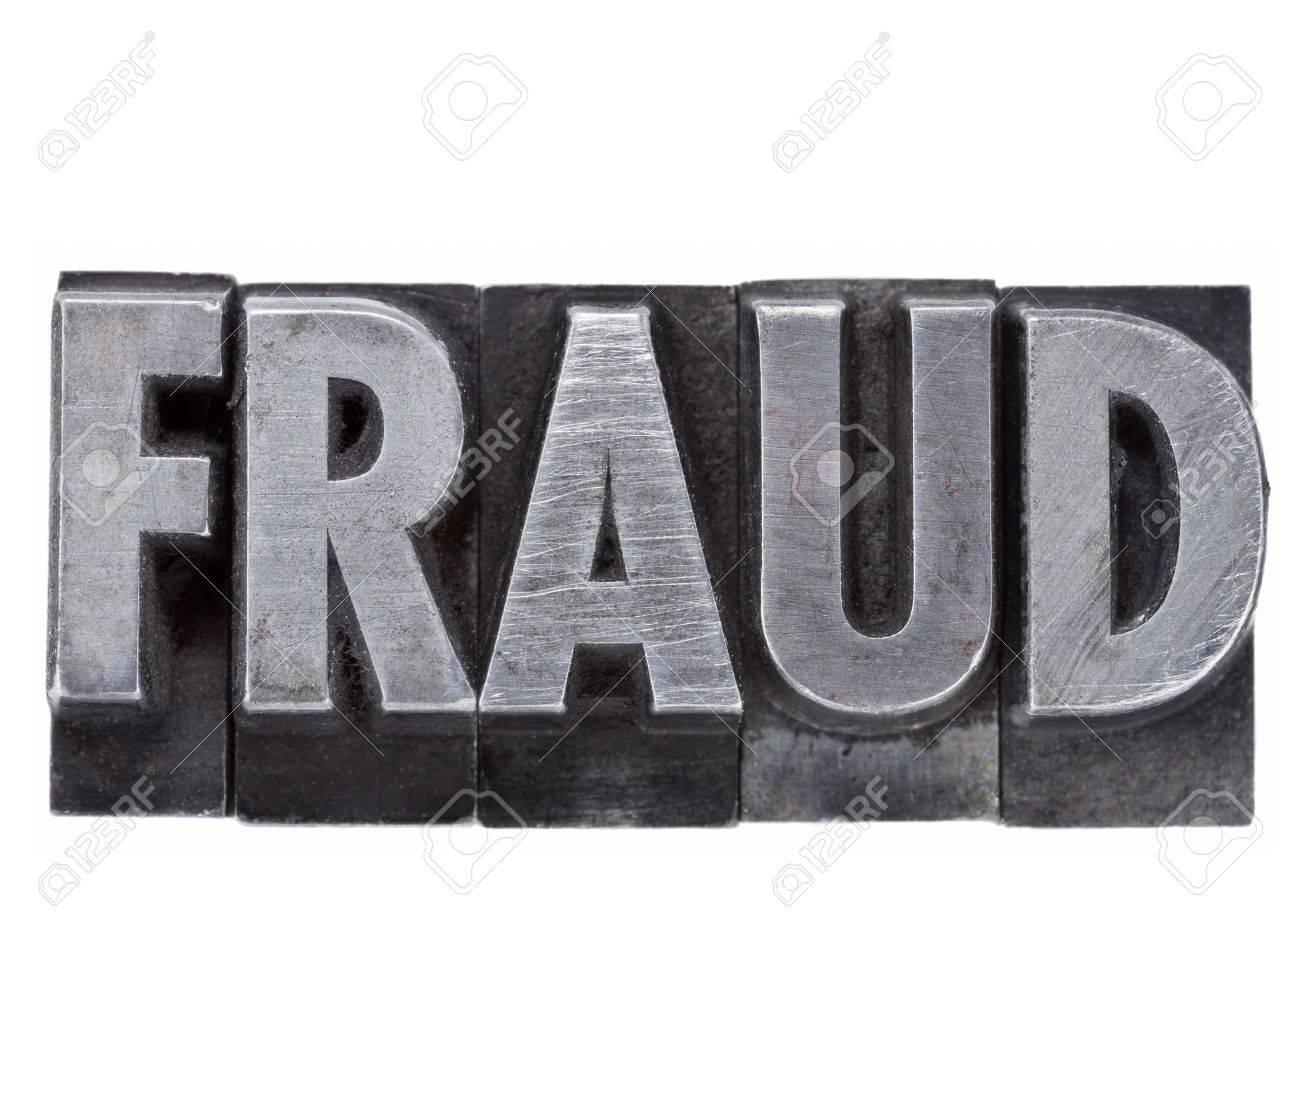 fraud - isolated word in vintage grunge metal letterpress type Stock Photo - 12114954